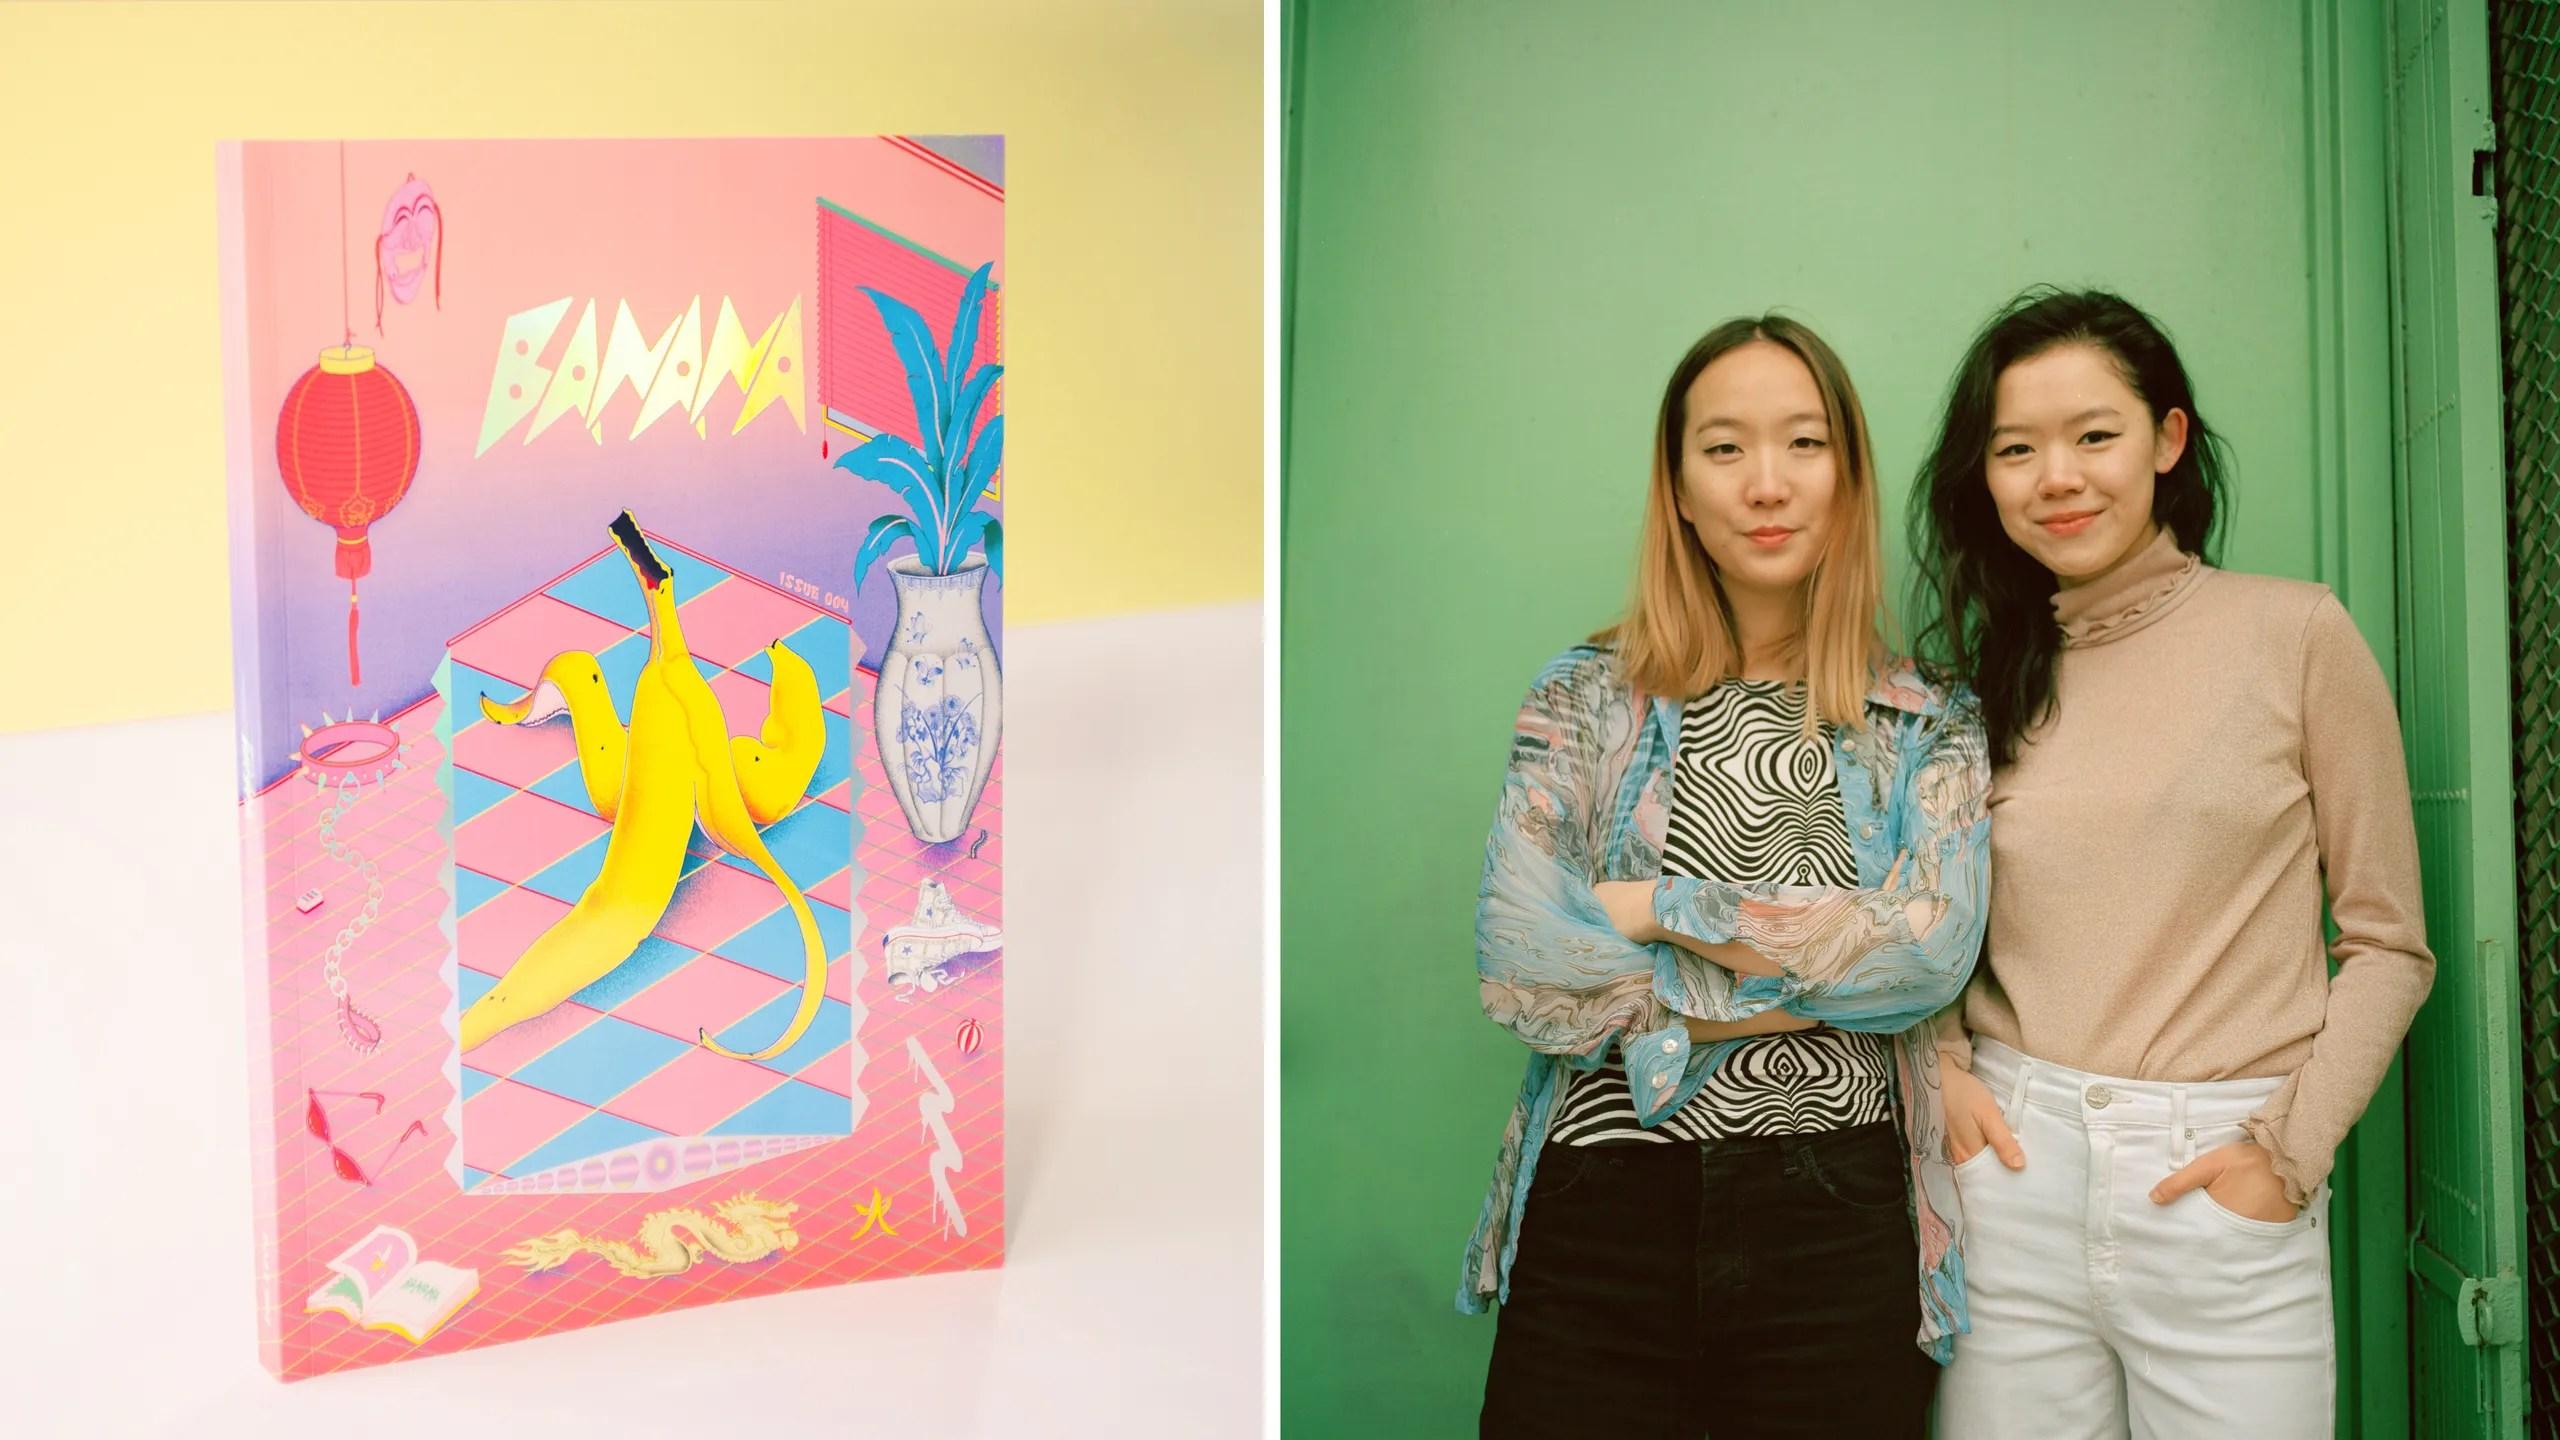 How Banana Magazine Is Exploring Asian American Gender